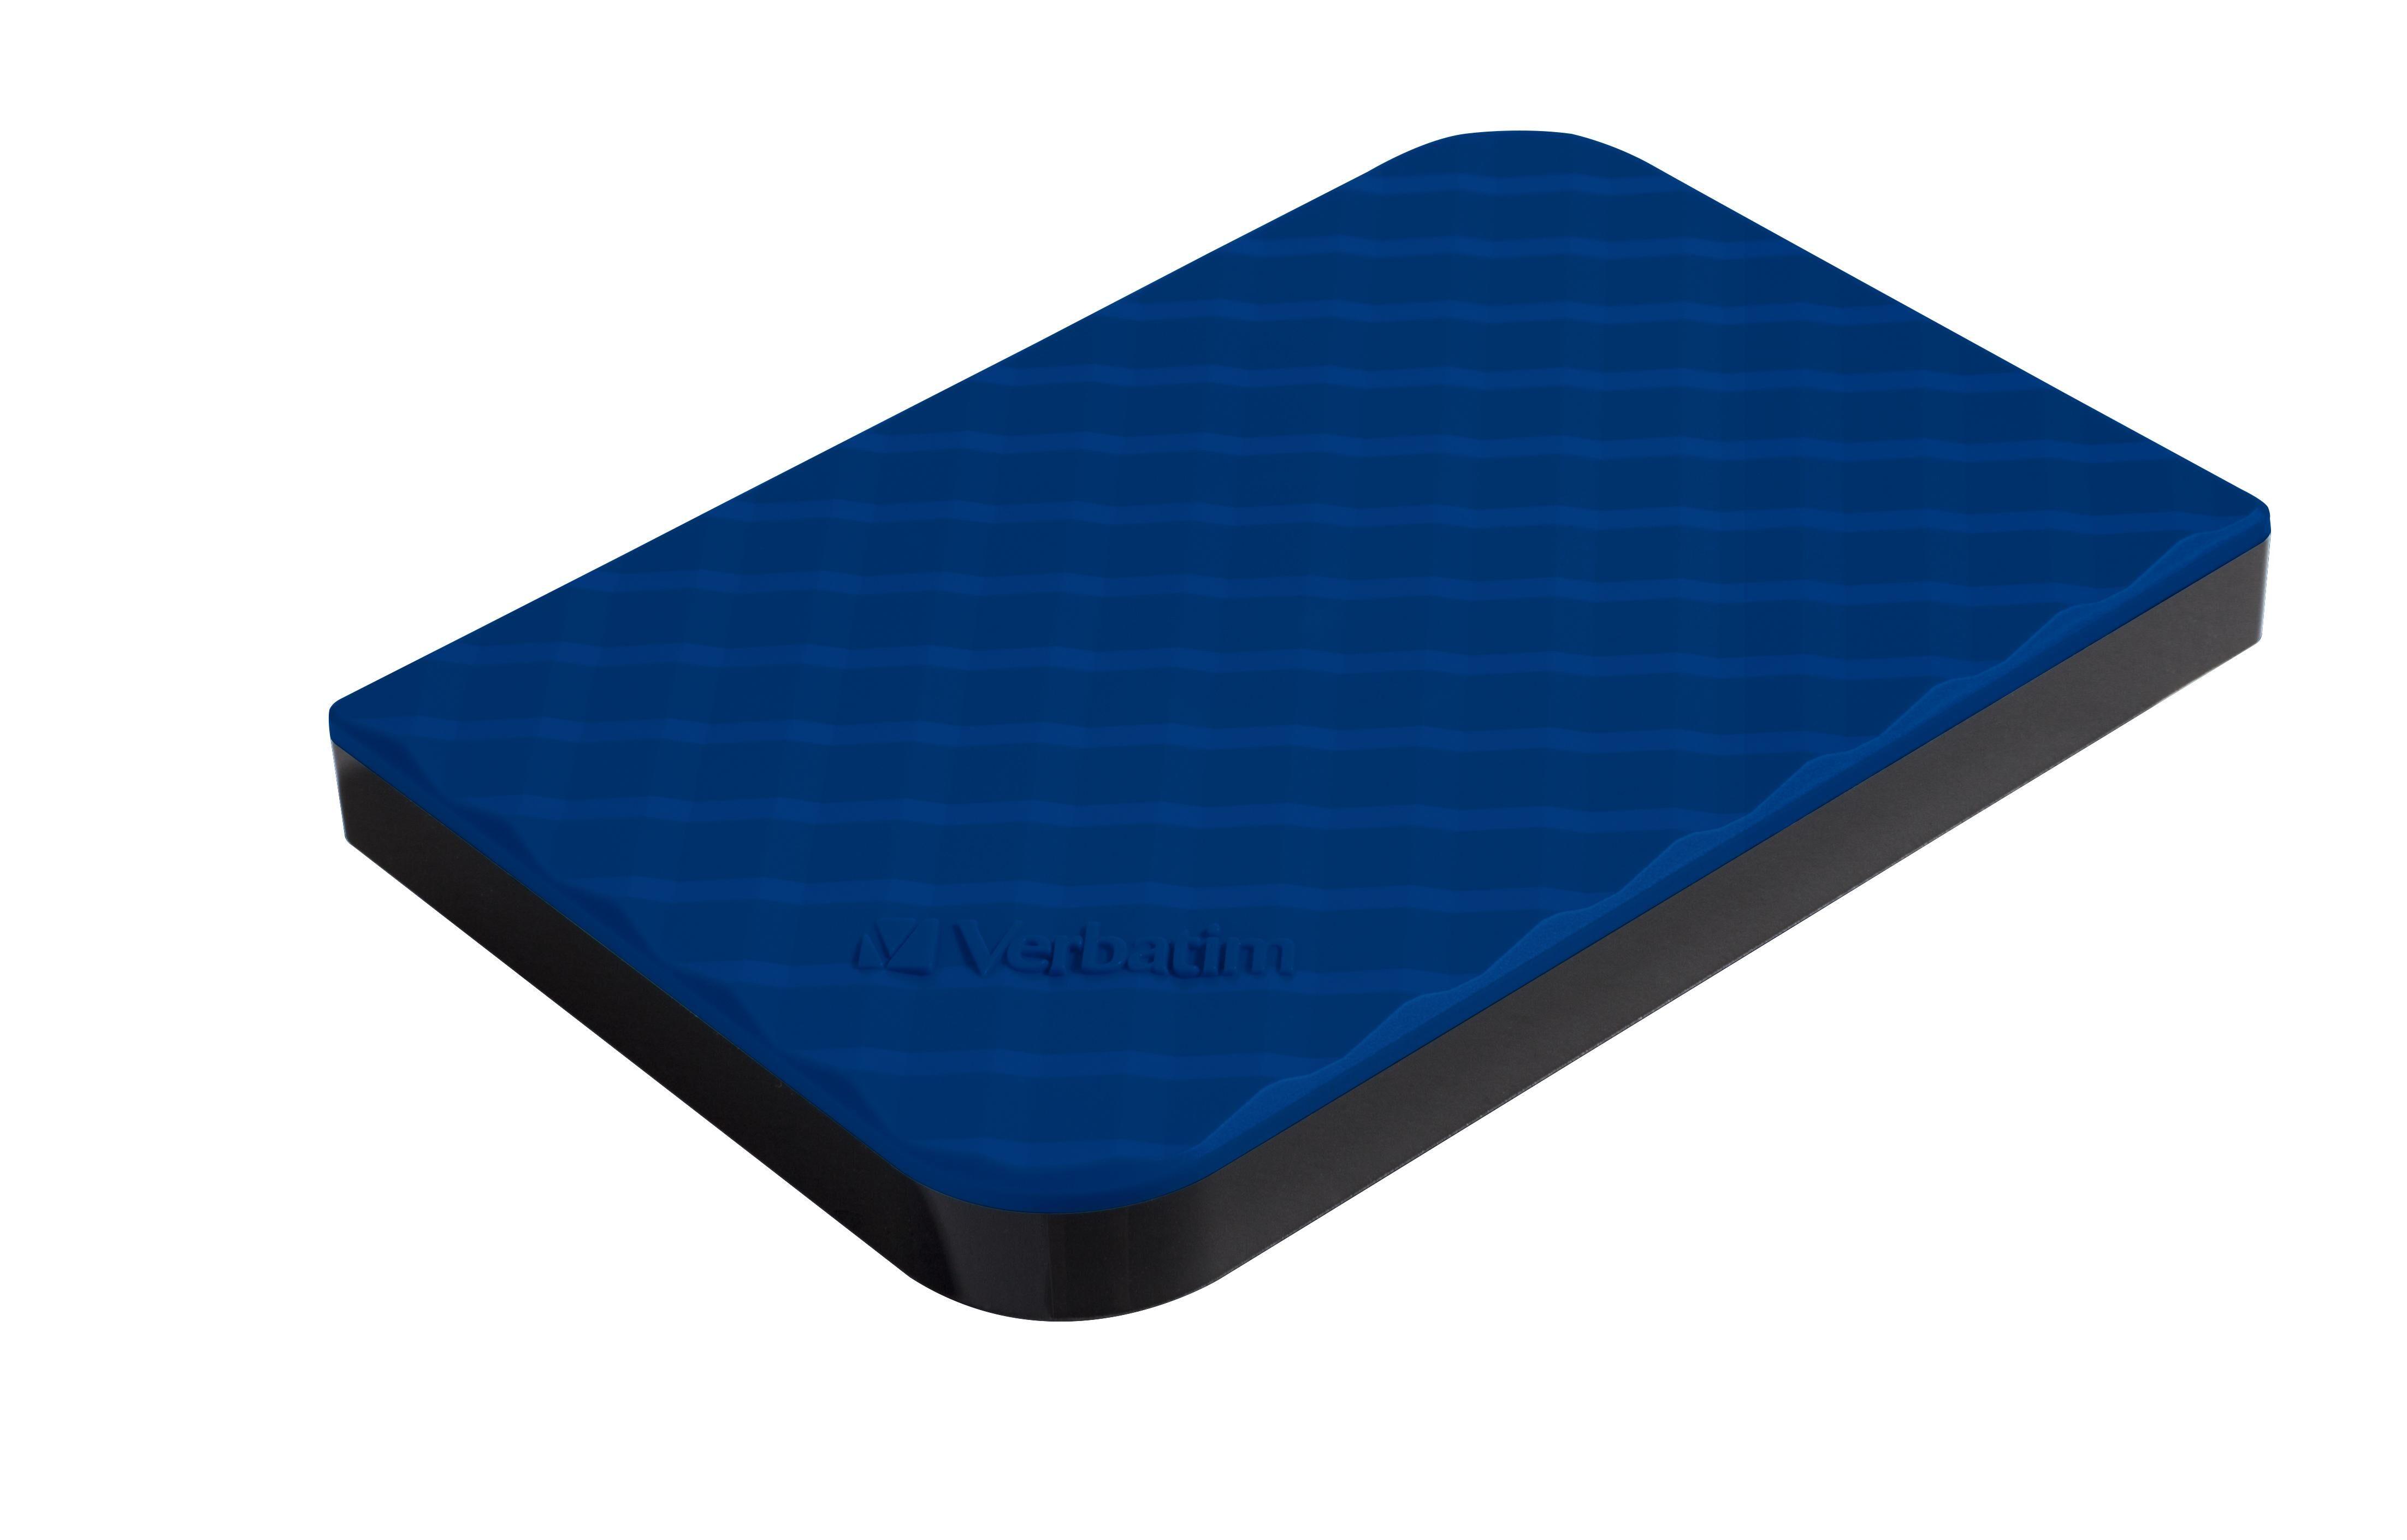 VERBATIM Disque dur portable USB Store 'n' Go 3.0, 1 To - Bleu